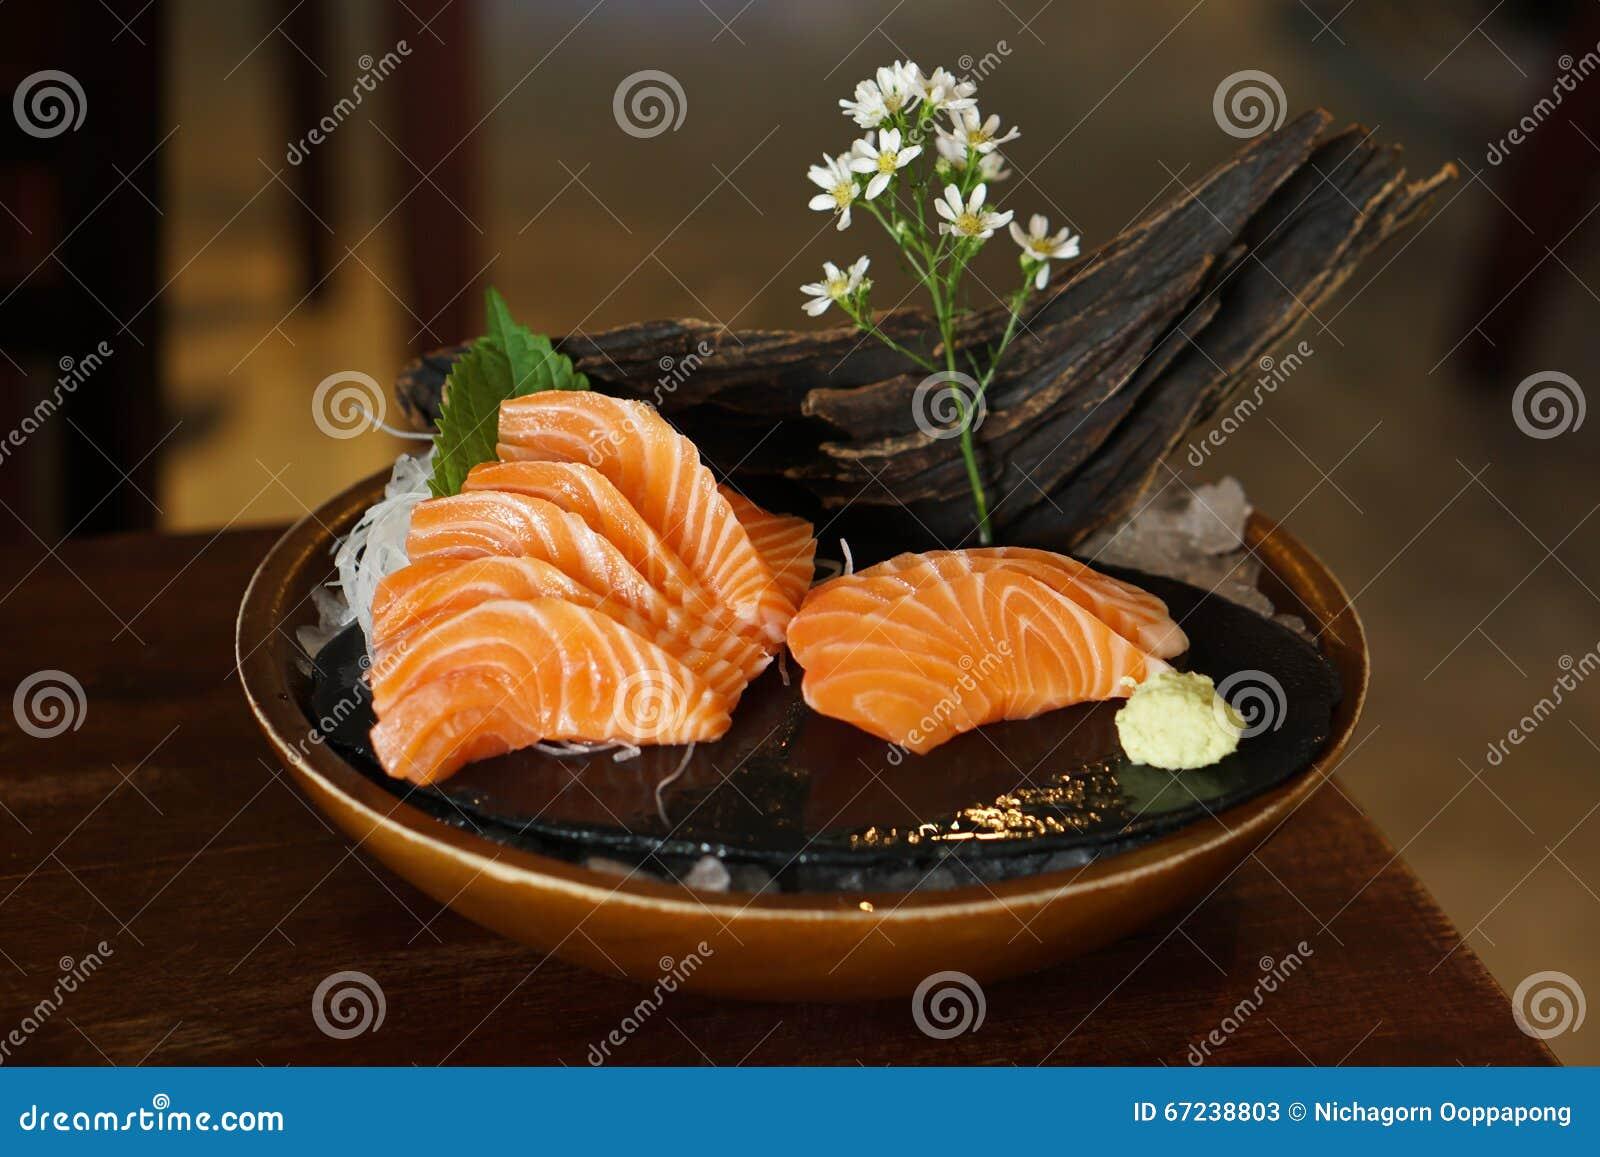 Comida japonesa - Salmon Sashimi